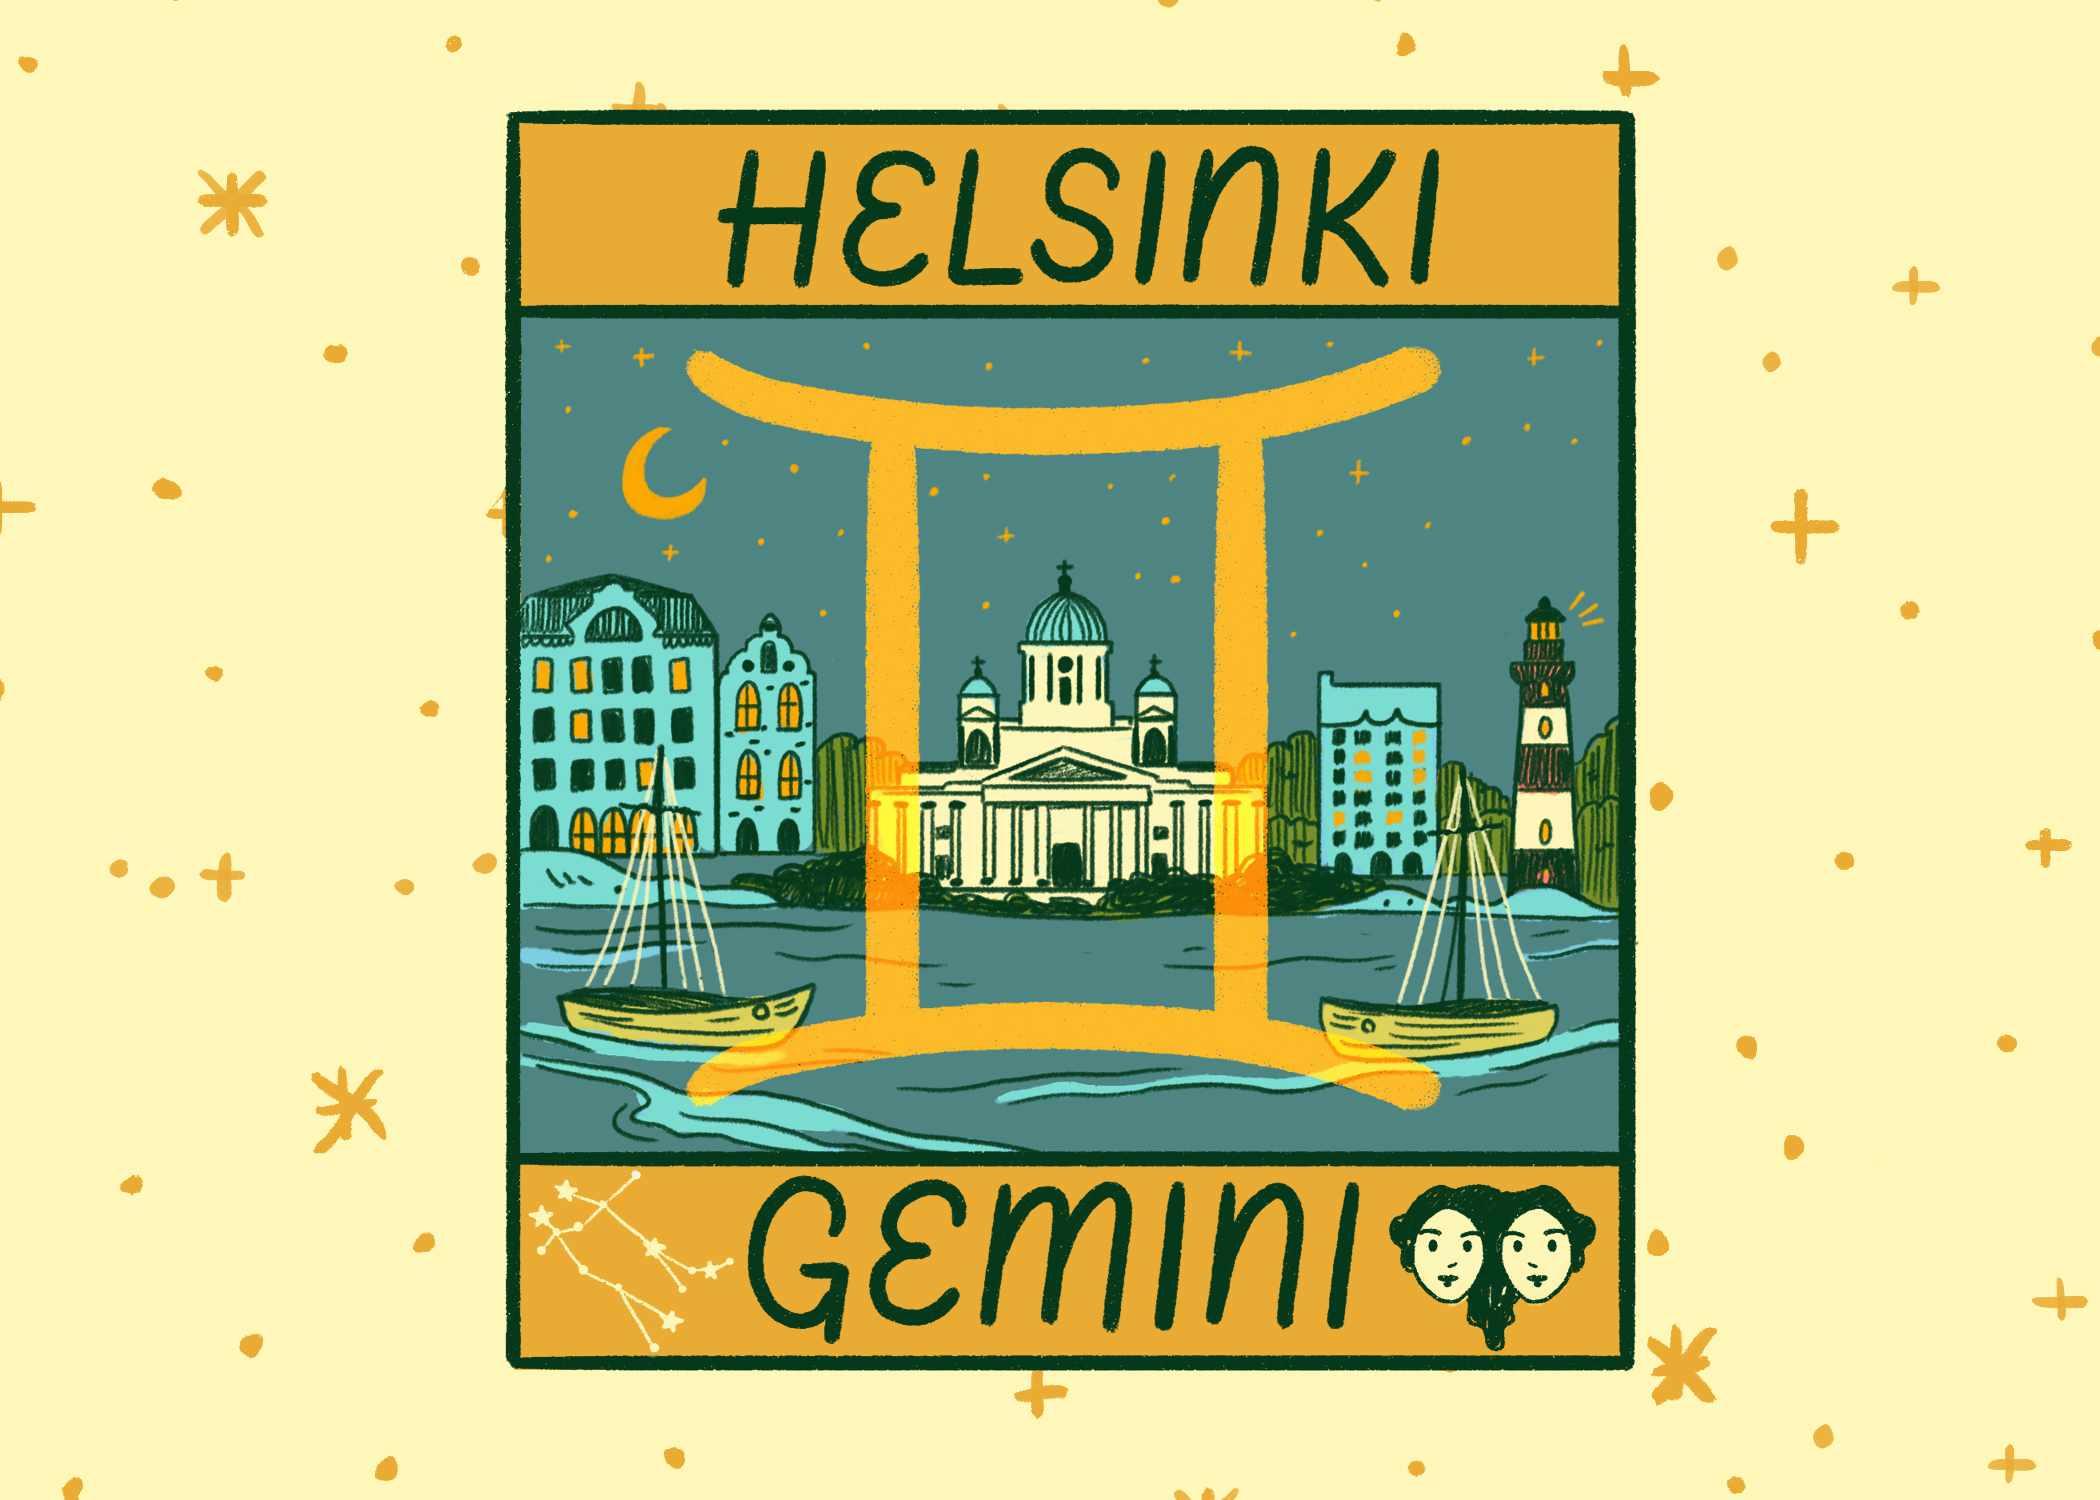 Illustration of Helsinki and Gemini